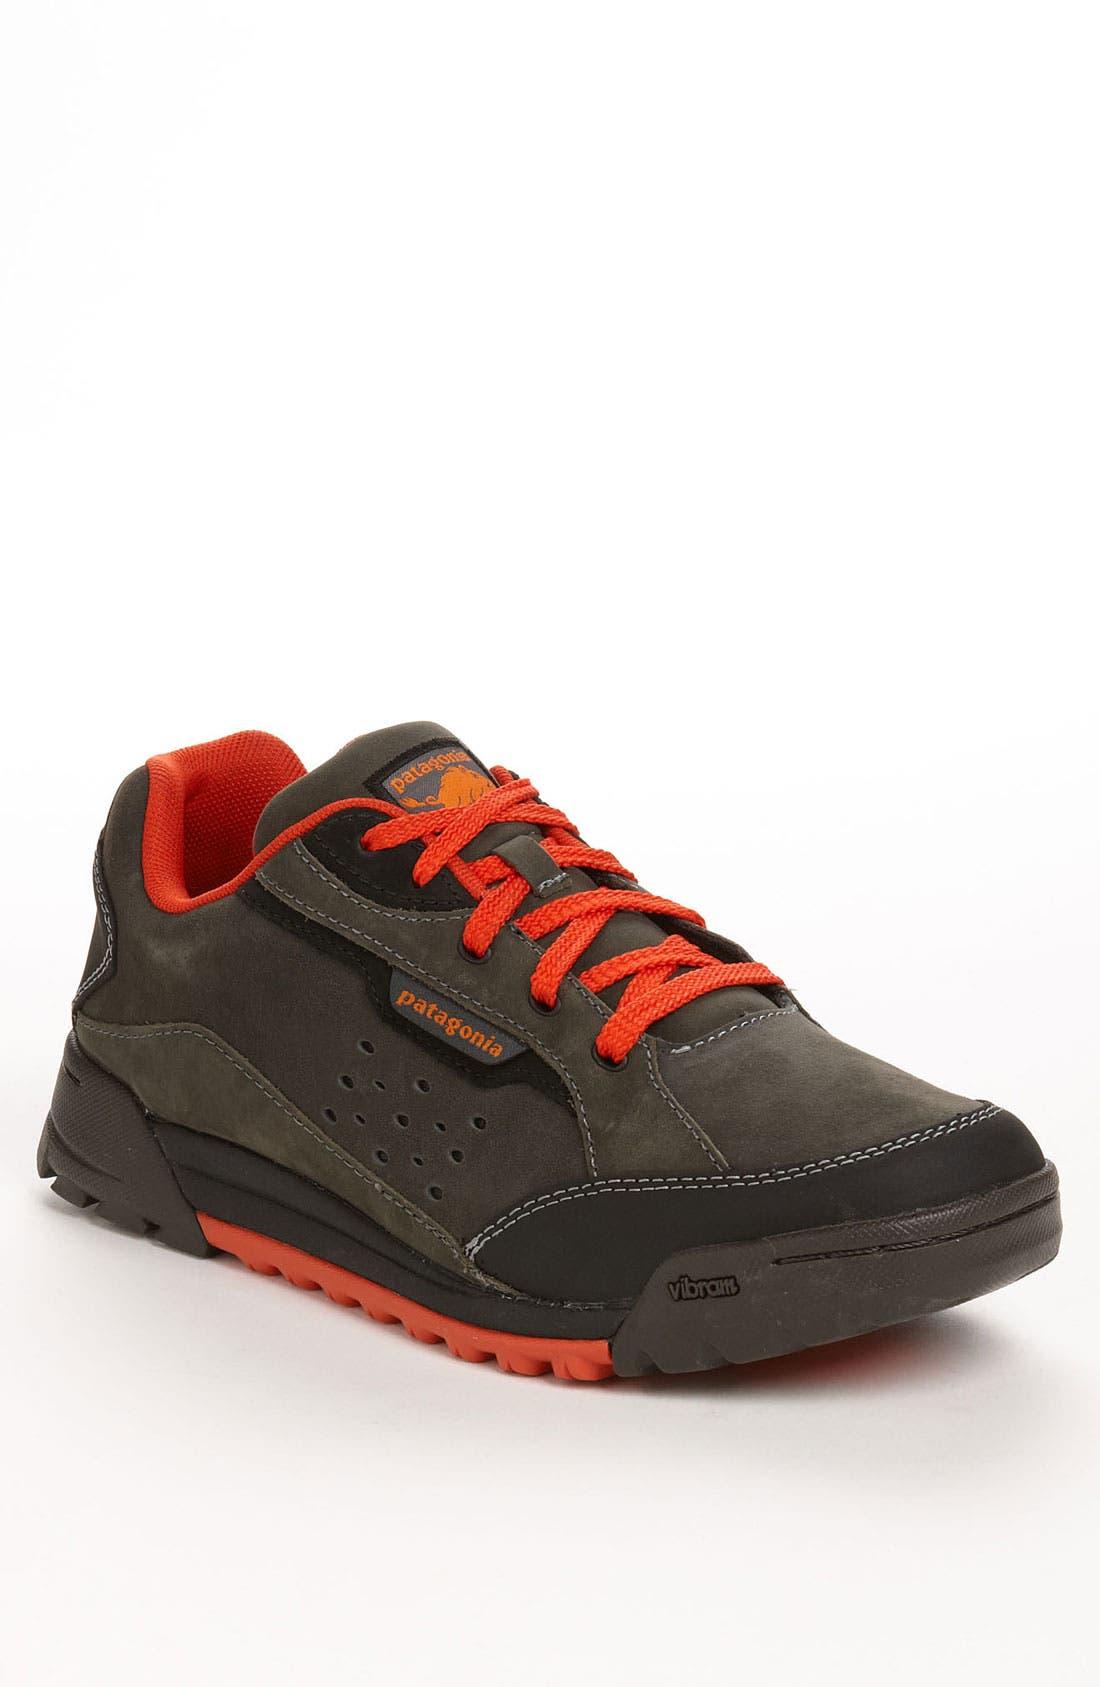 Alternate Image 1 Selected - Patagonia 'Boaris 2' Walking Shoe (Men)